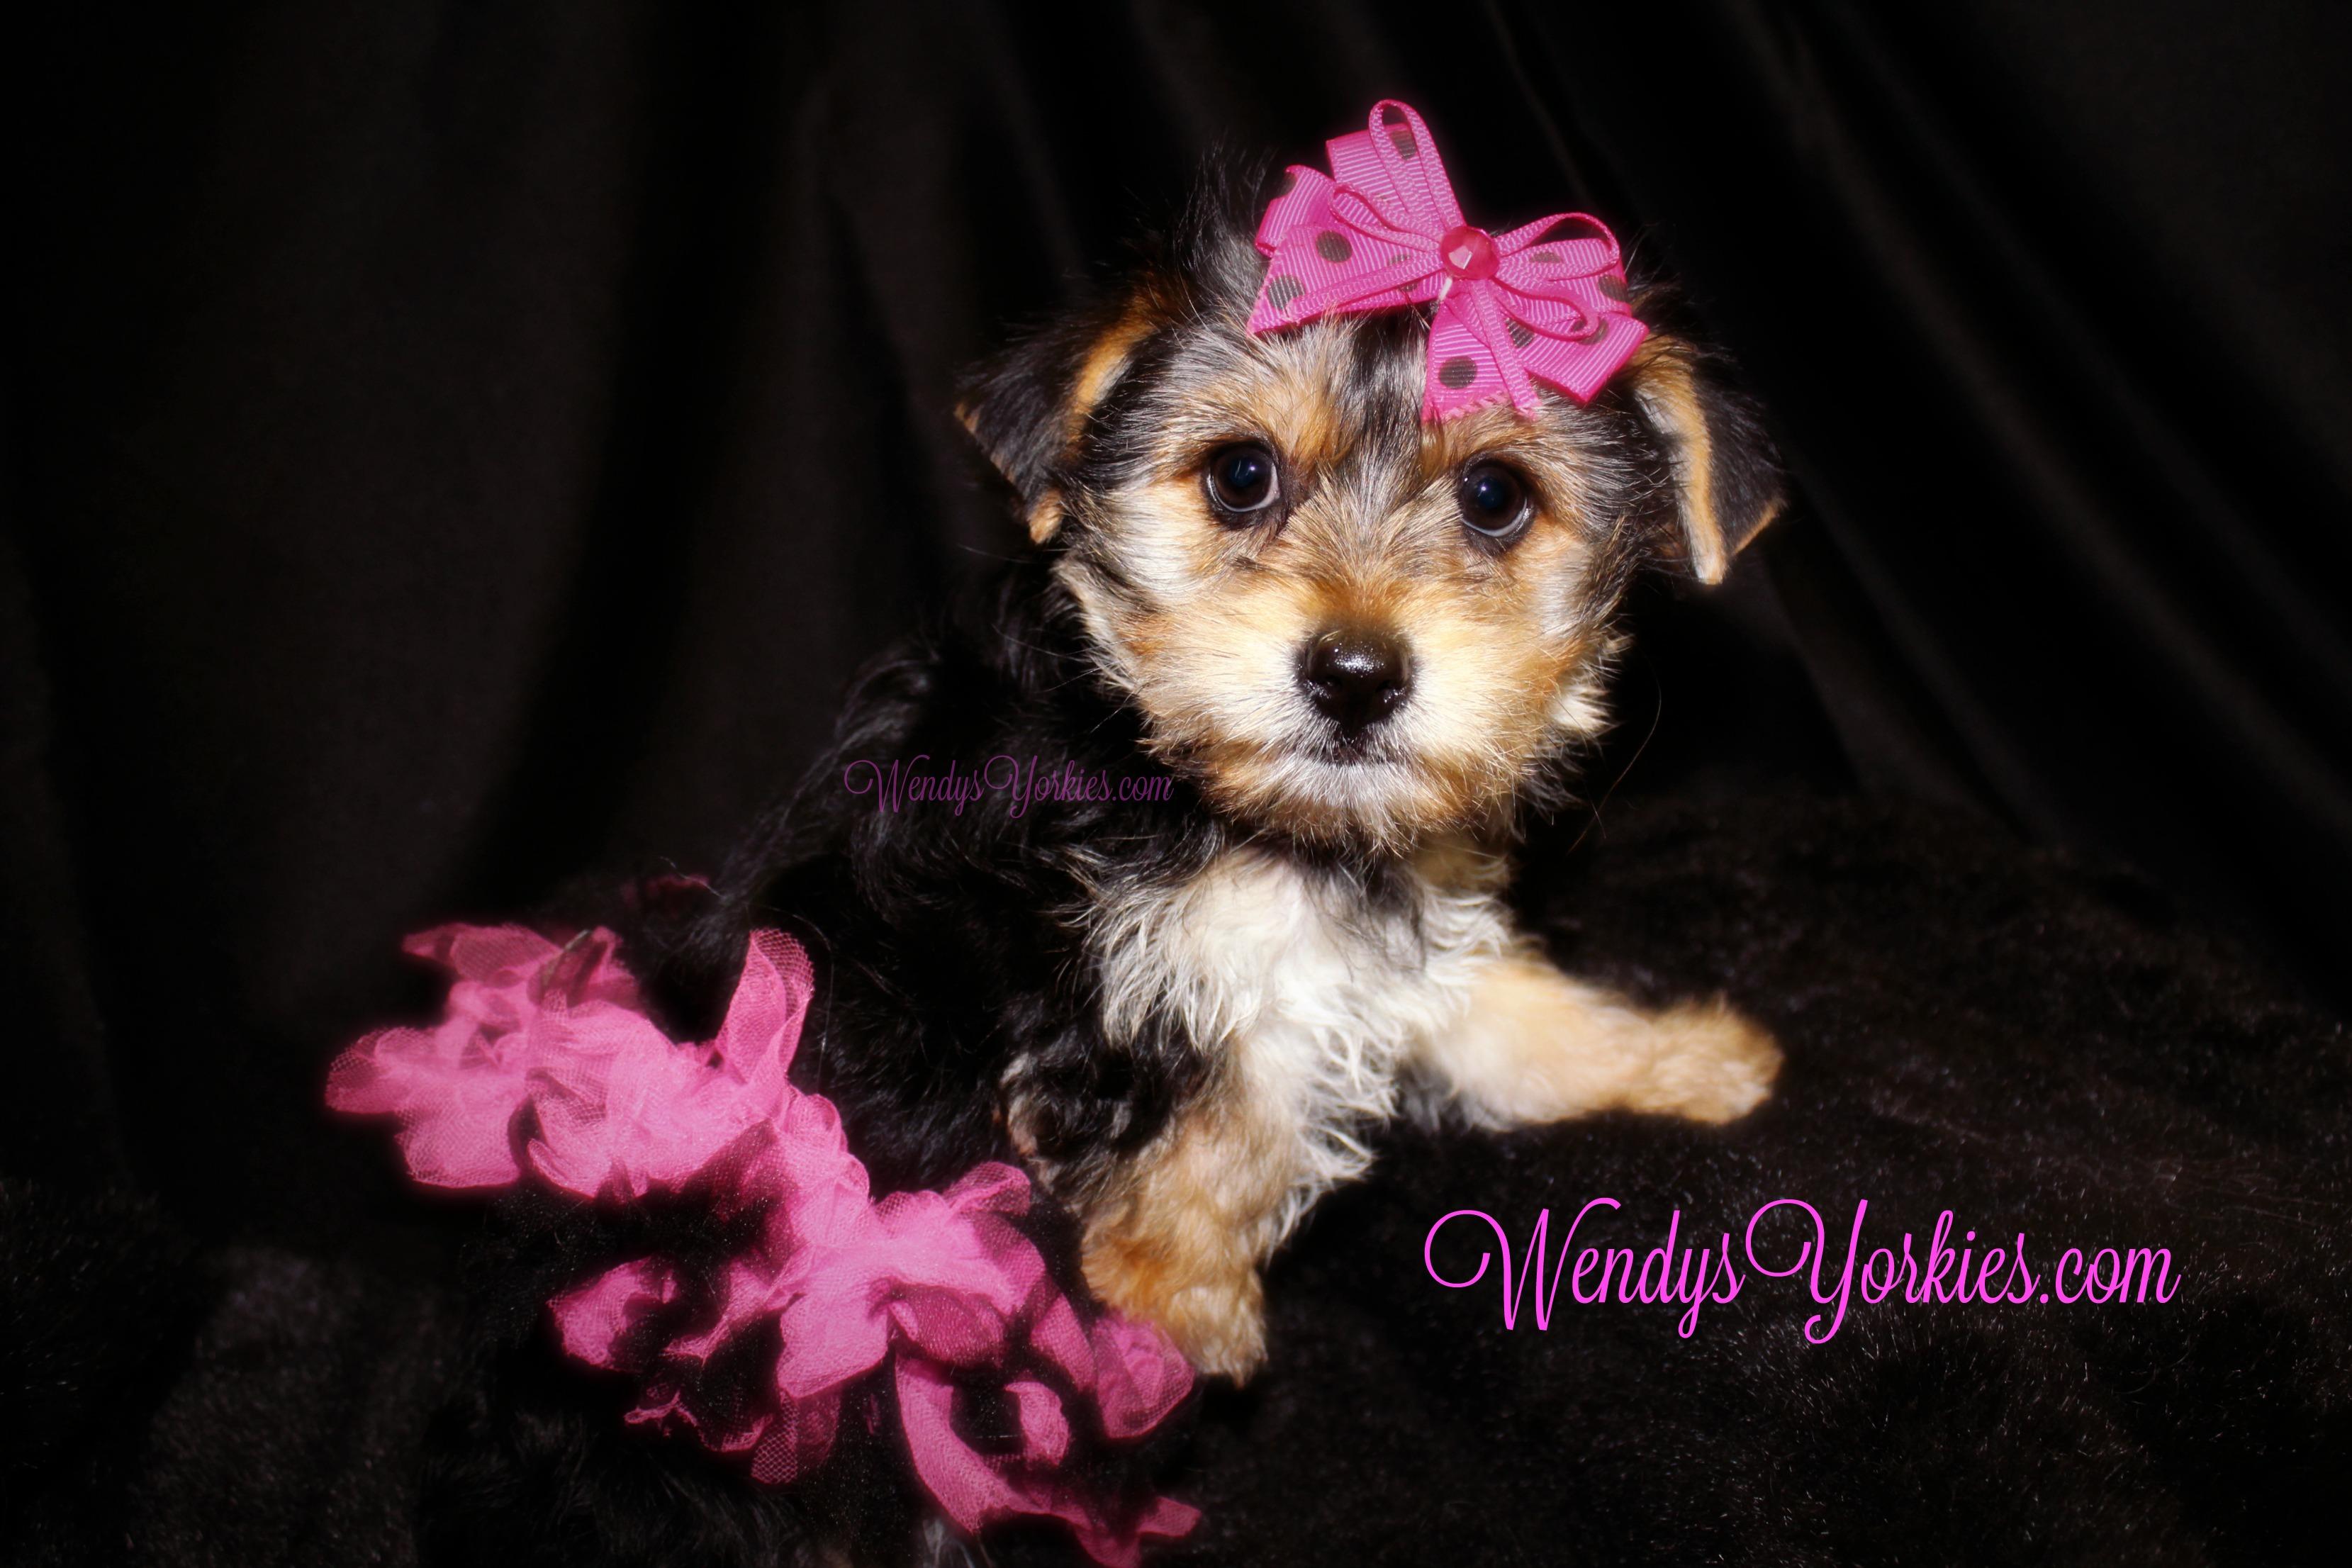 Cute YOrkie puppy for sale, WendysYorkies.com, TH f